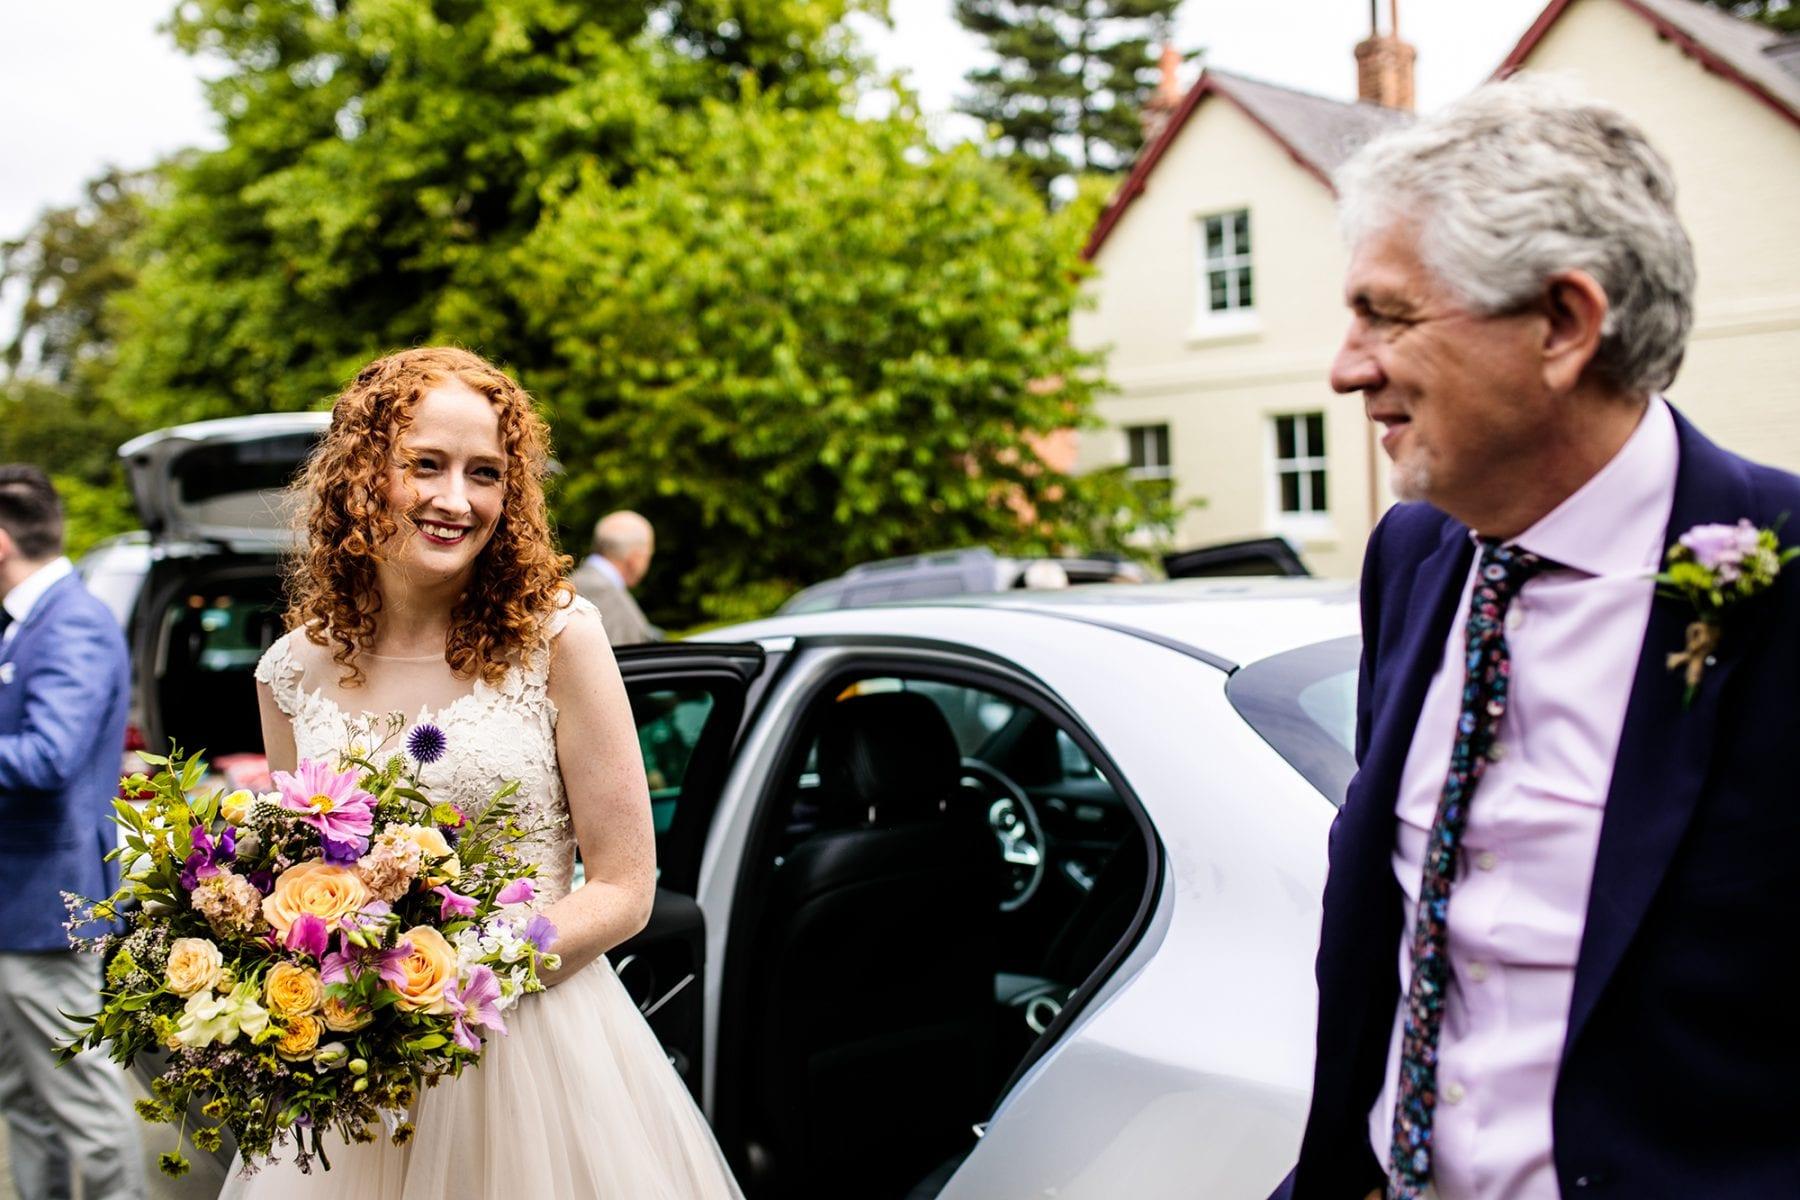 Wedding Photographer St. Mary's Eccleston